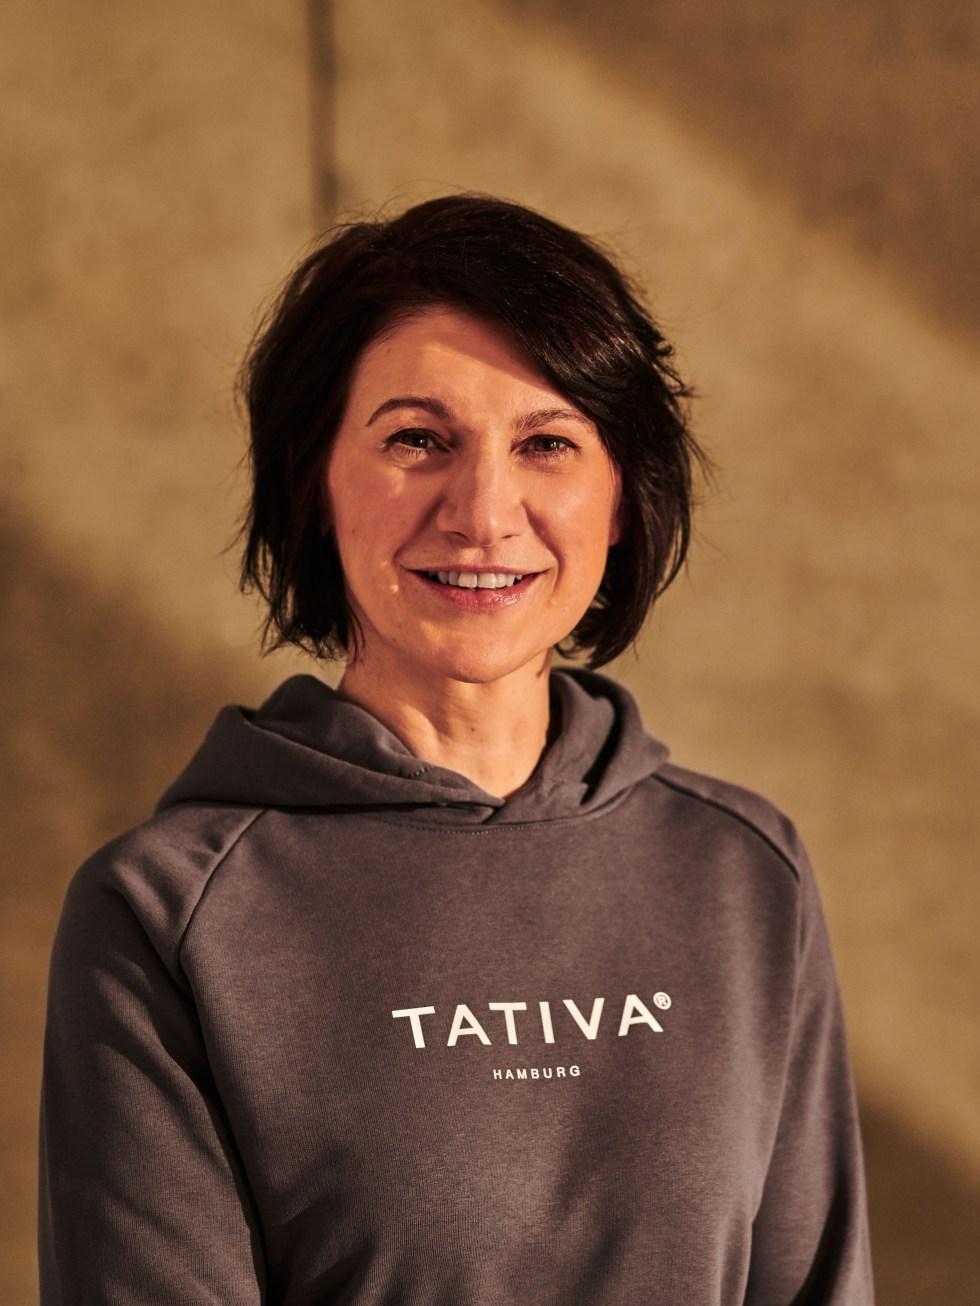 Portraitfoto Tanja Bindschädel von Tativa